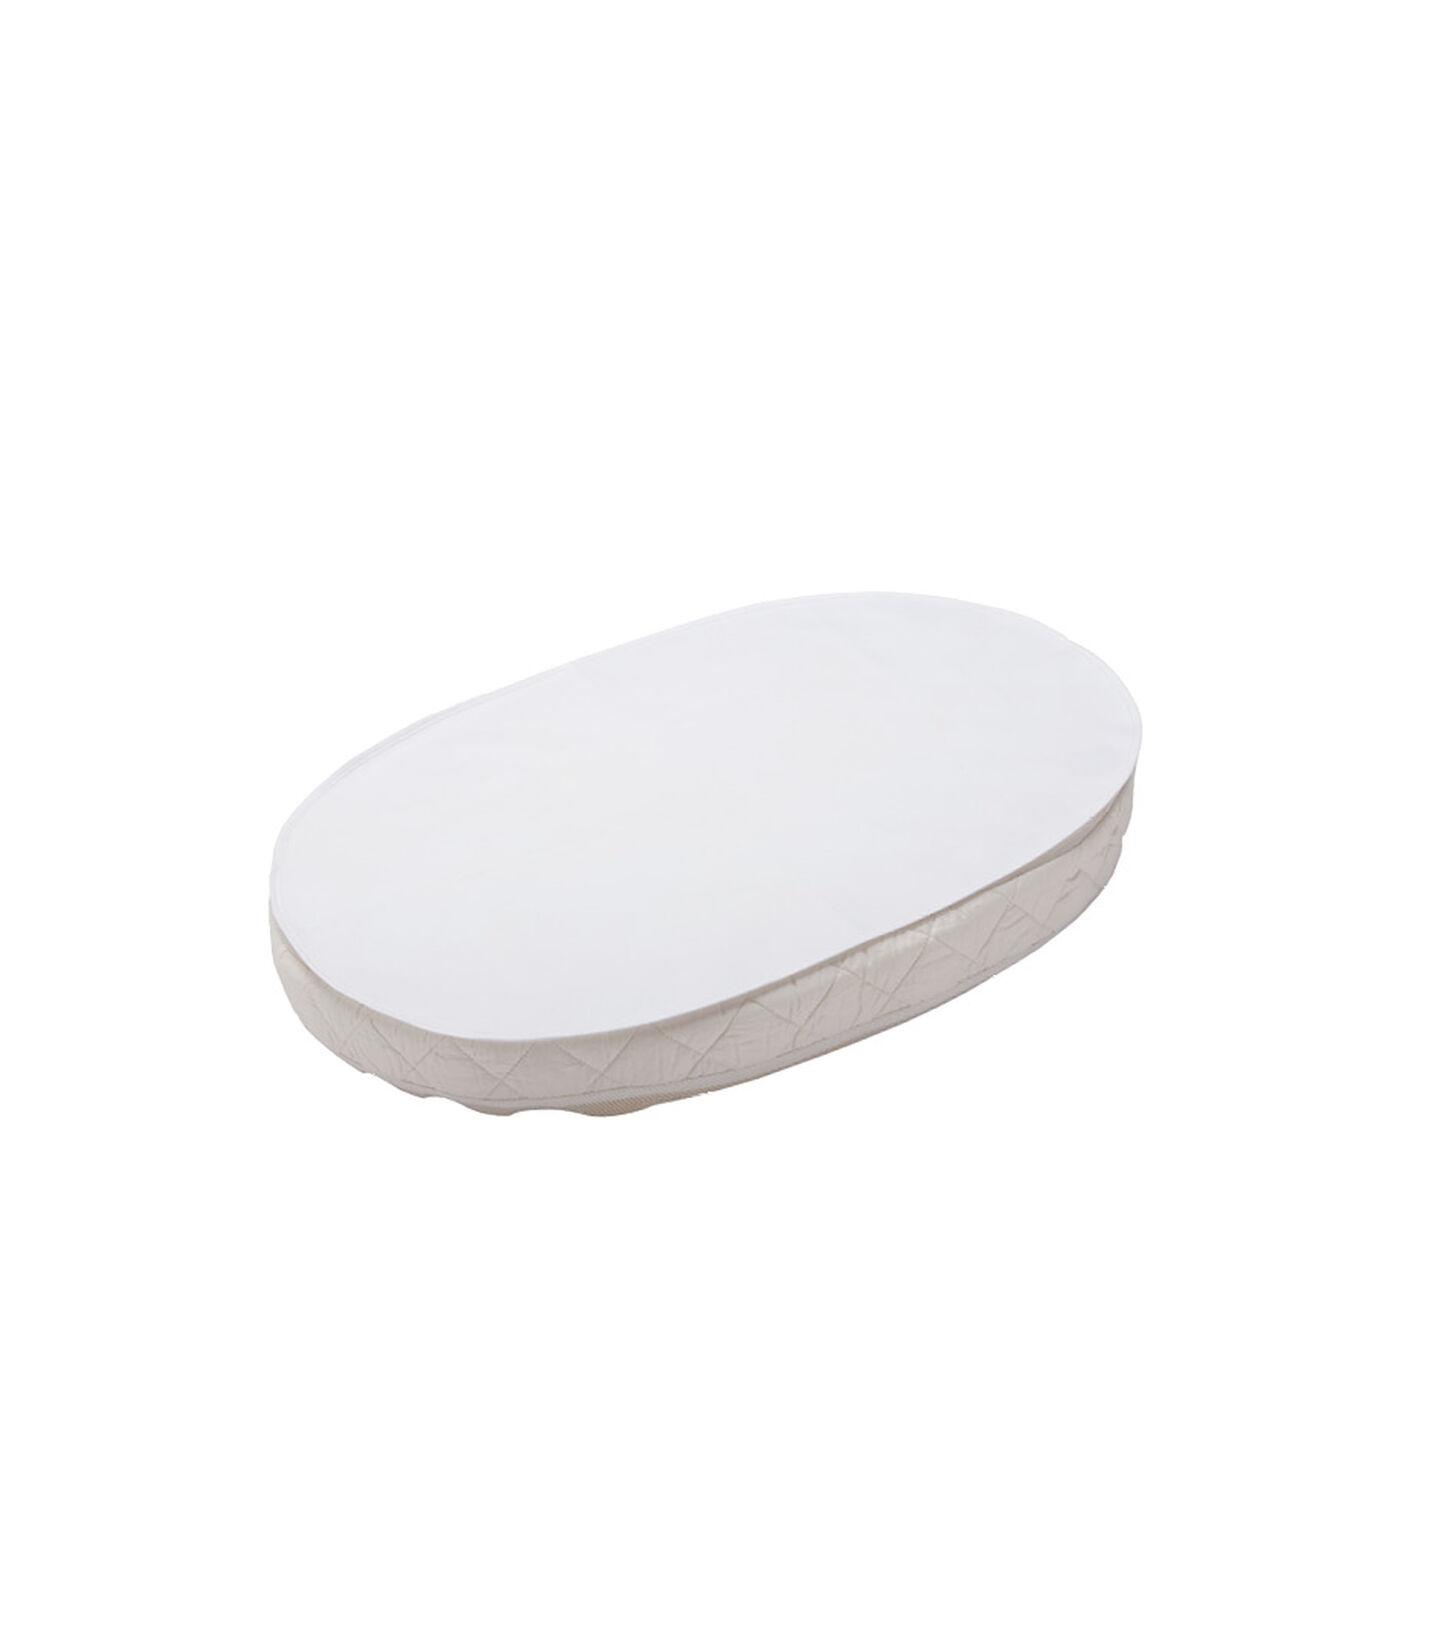 Stokke® Sleepi™ Mini Protection Sheet Oval, , mainview